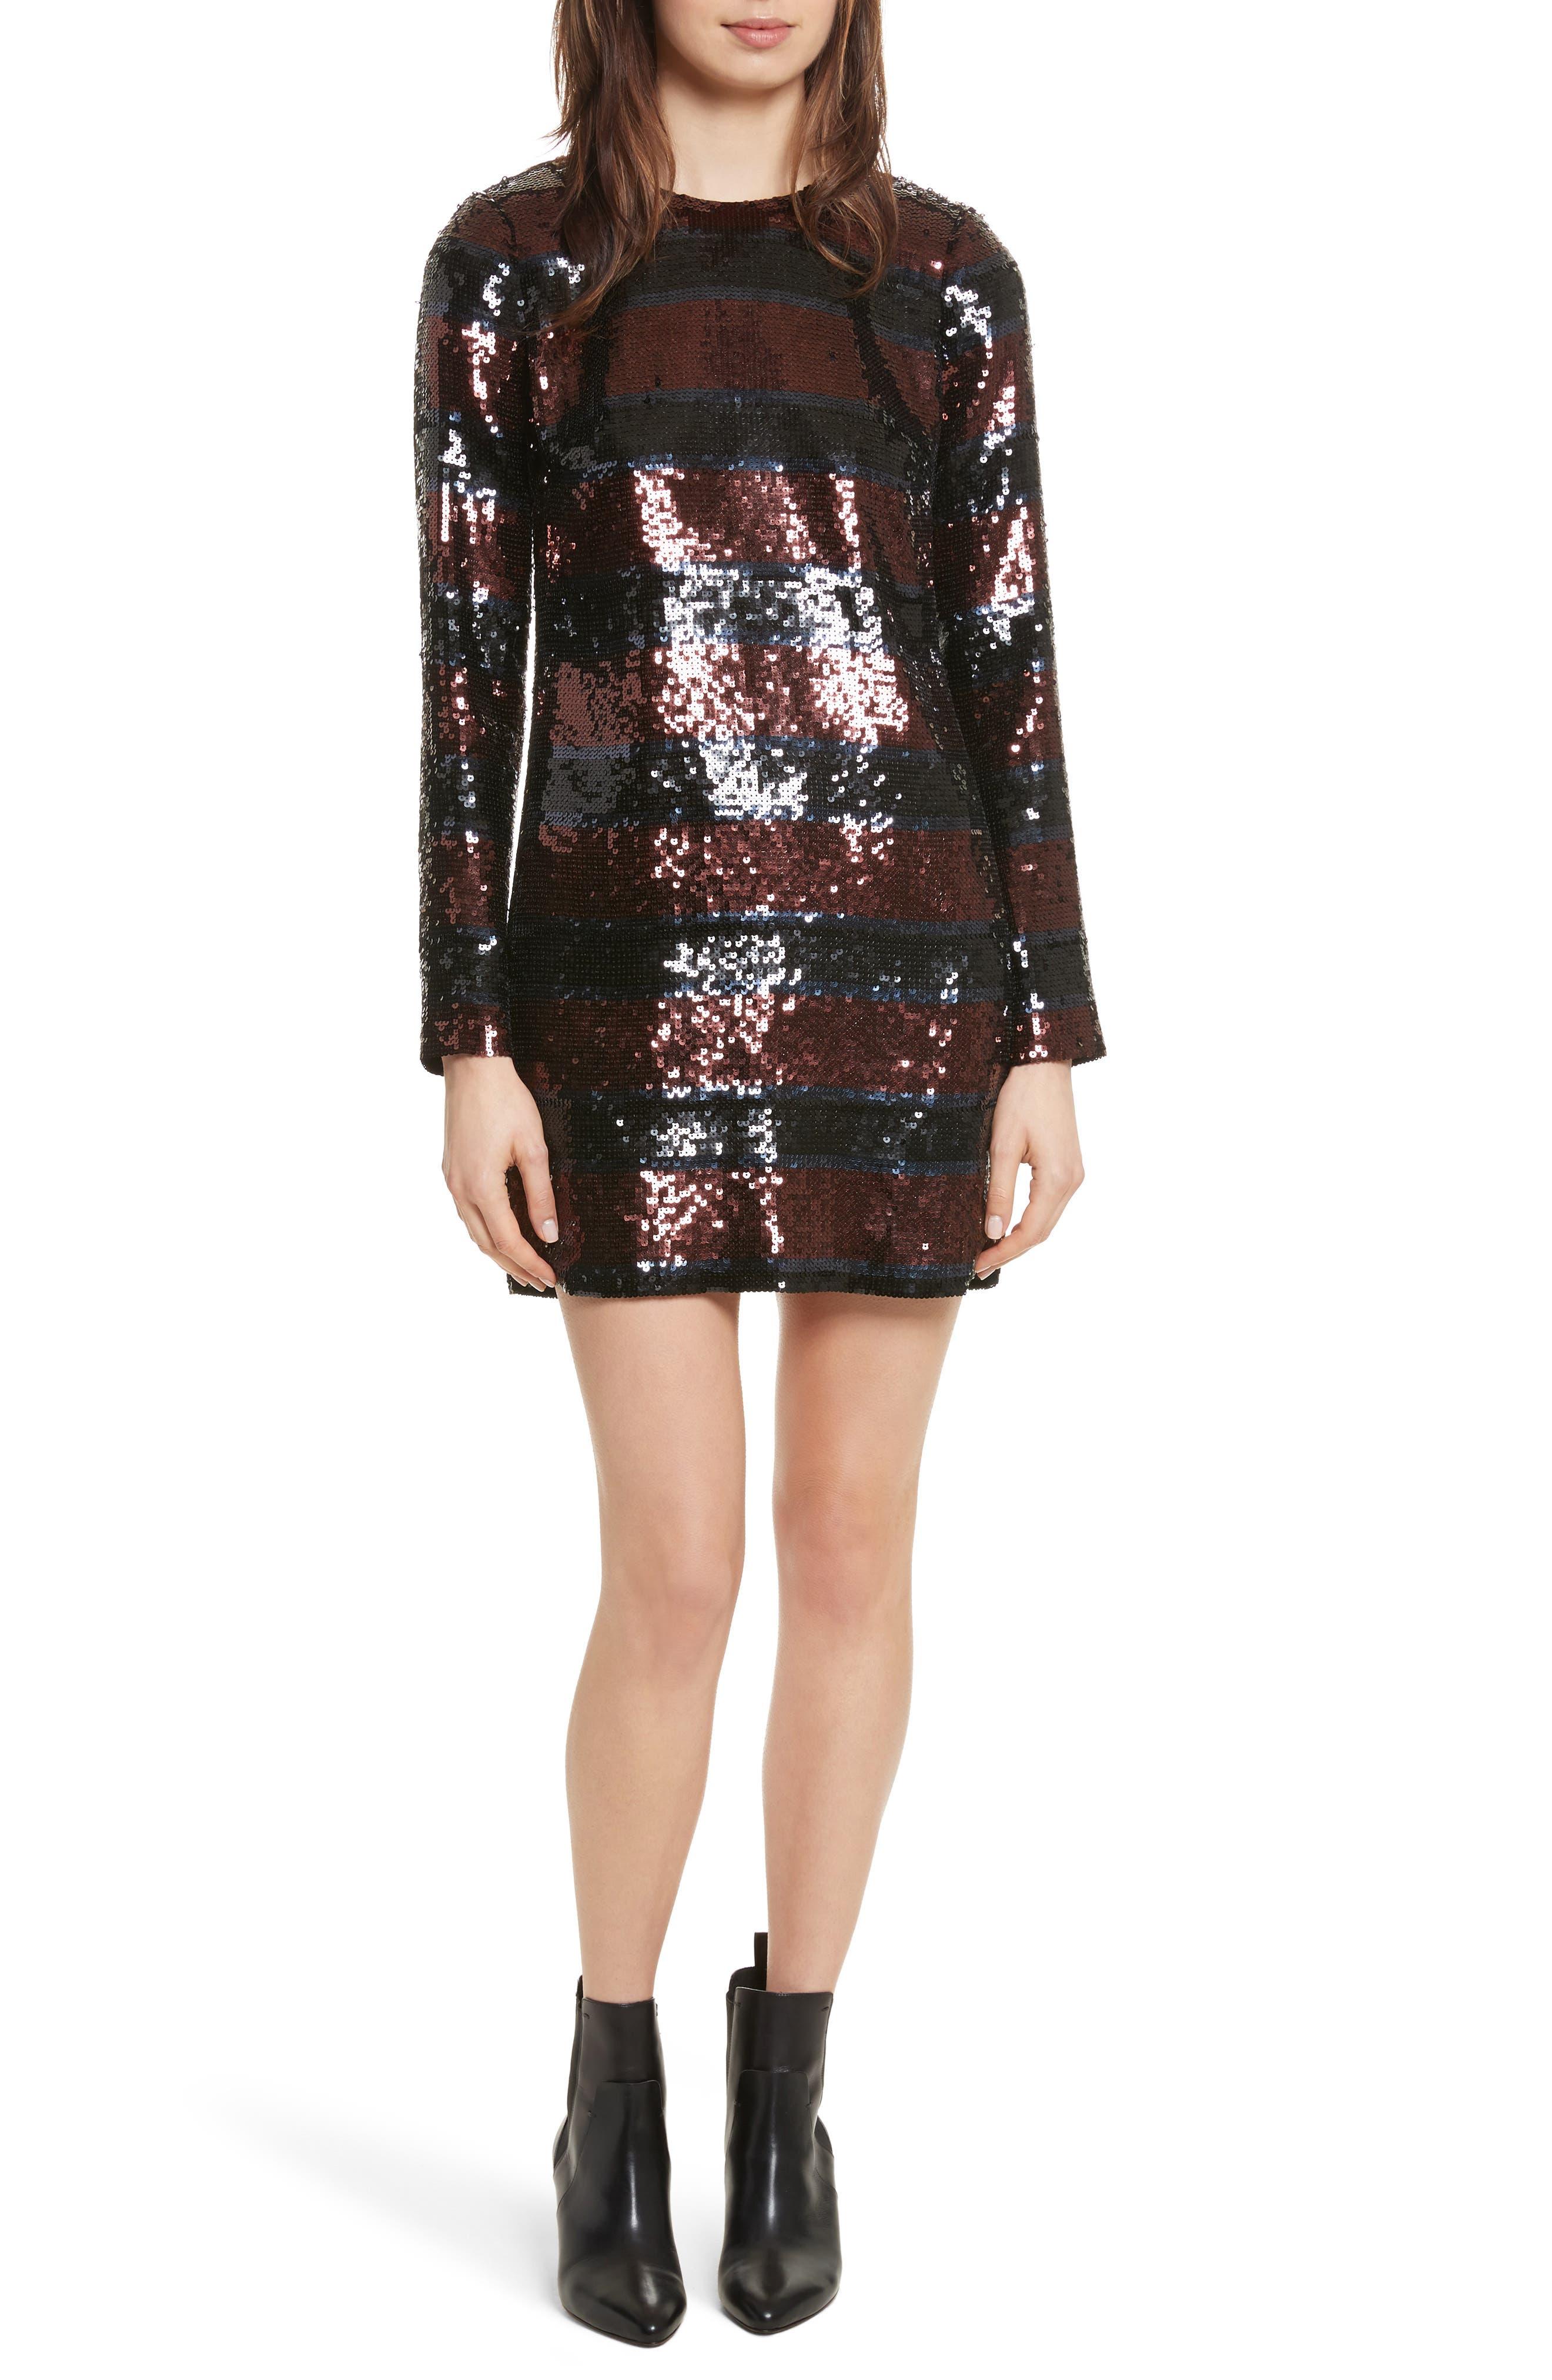 Alternate Image 1 Selected - Veronica Beard Breakers Sequin Dress